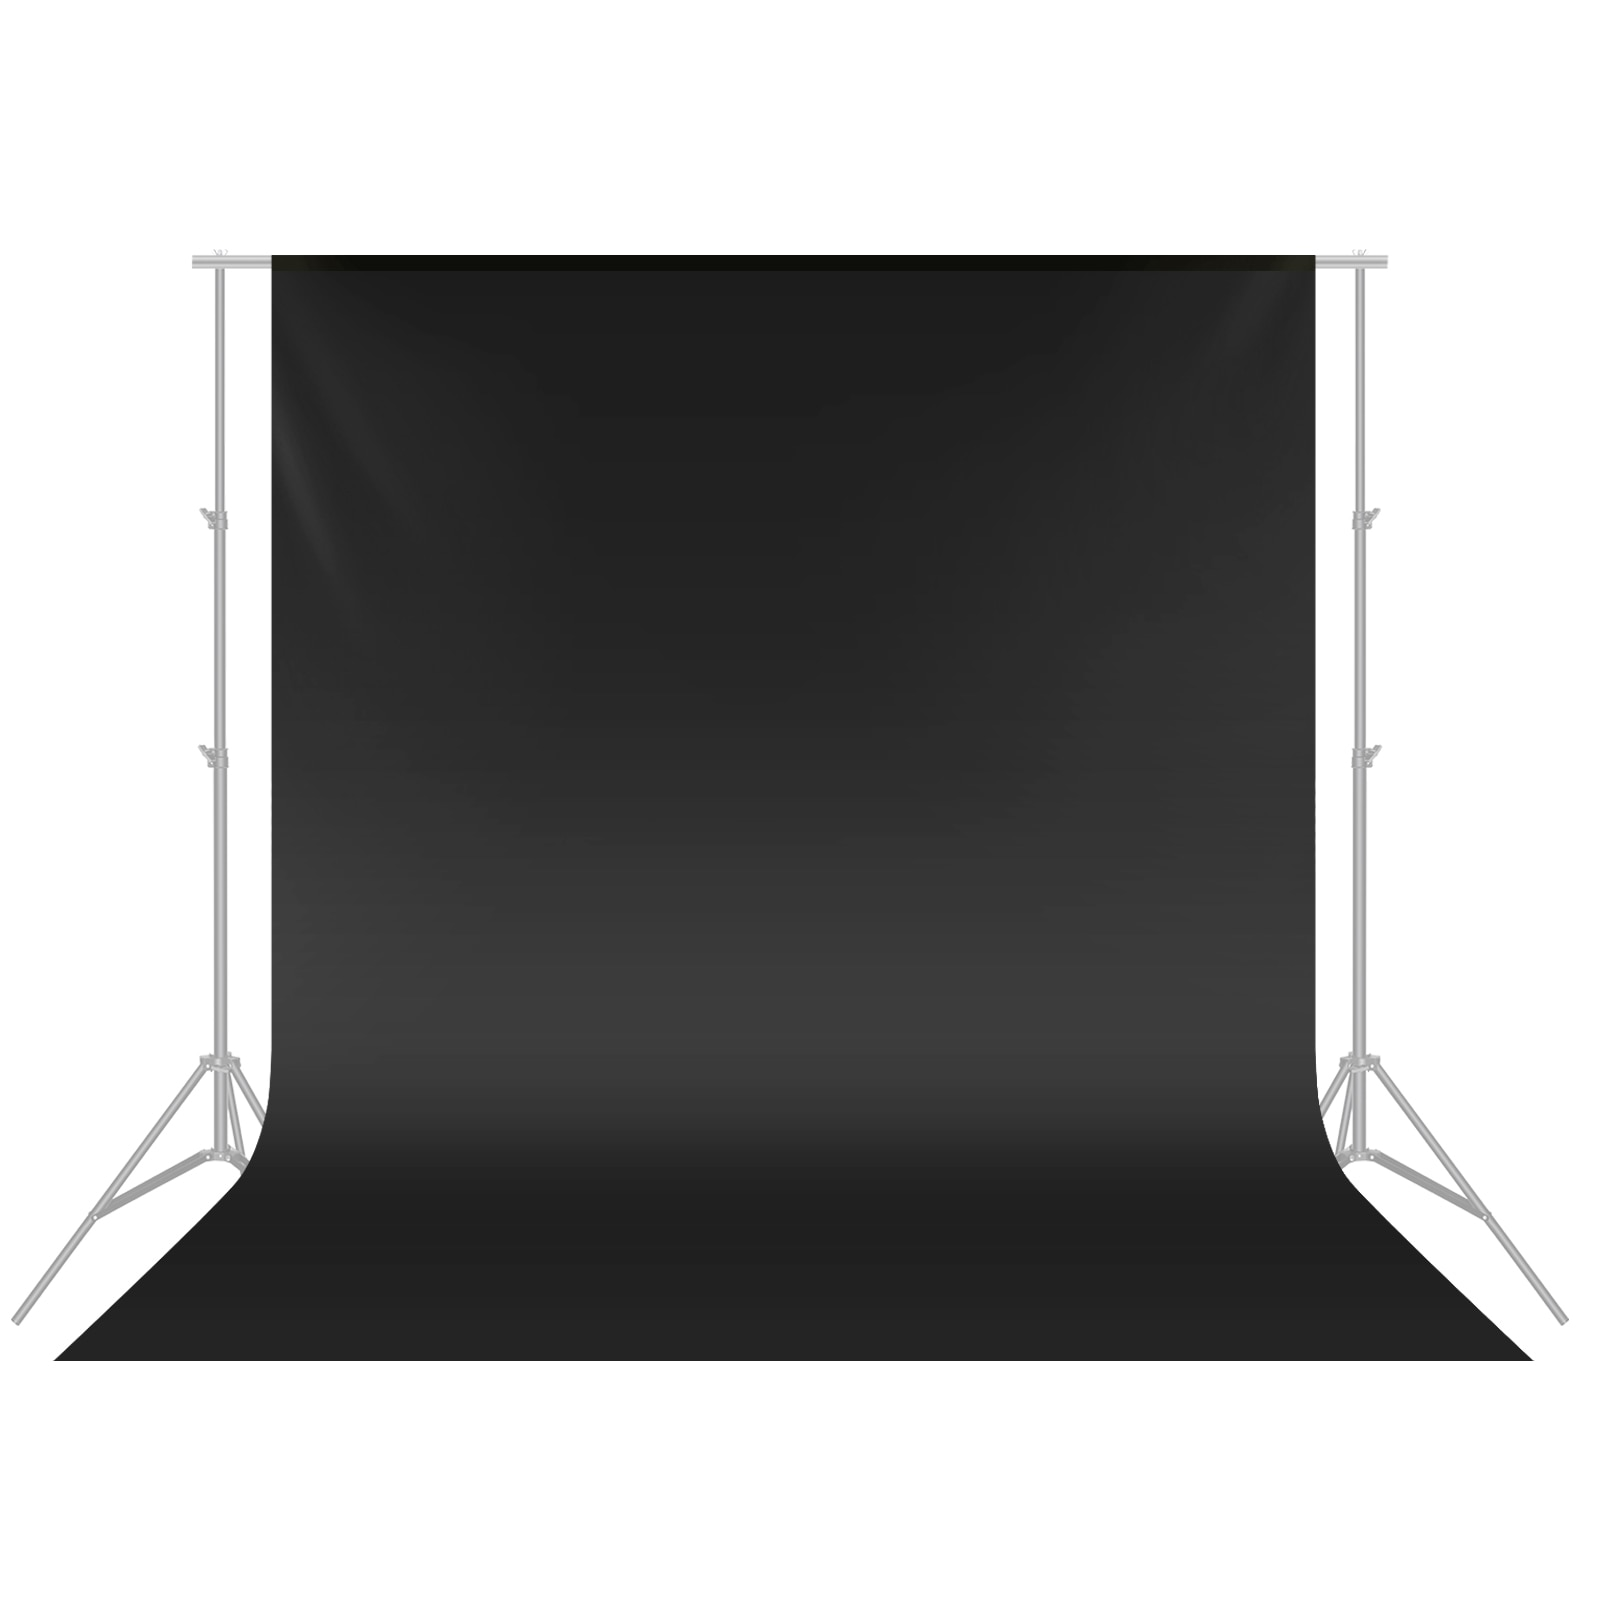 Neewer-خلفيات استوديو صور احترافية 3.6 ، 3 × 100% م ، قماش نقي قابل للطي ، خلفية قماشية ، للبيع